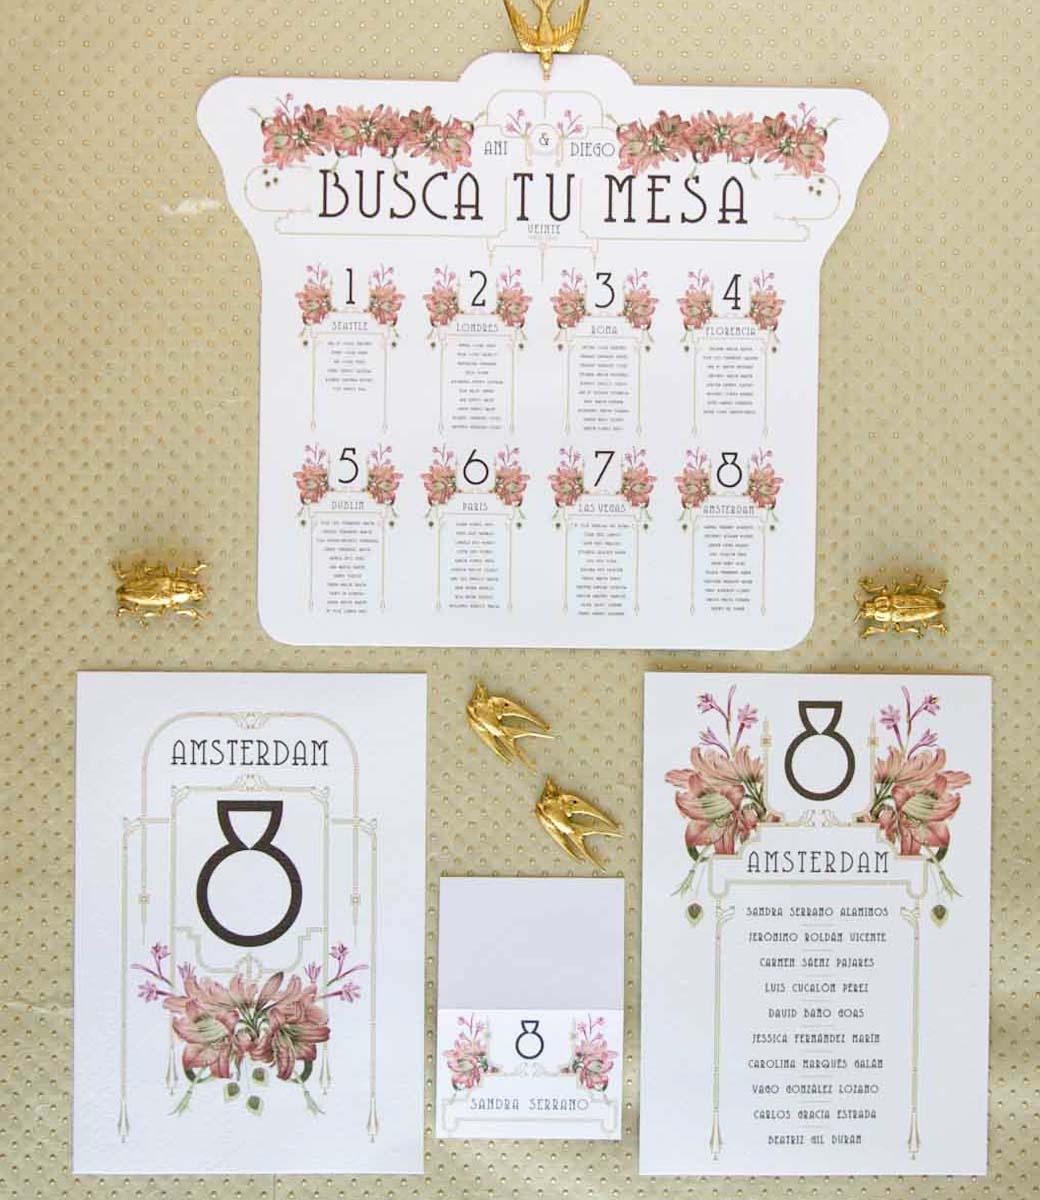 Invitaciones de boda acuarela Gatsby - papeleria completa - seating - pai pai-19